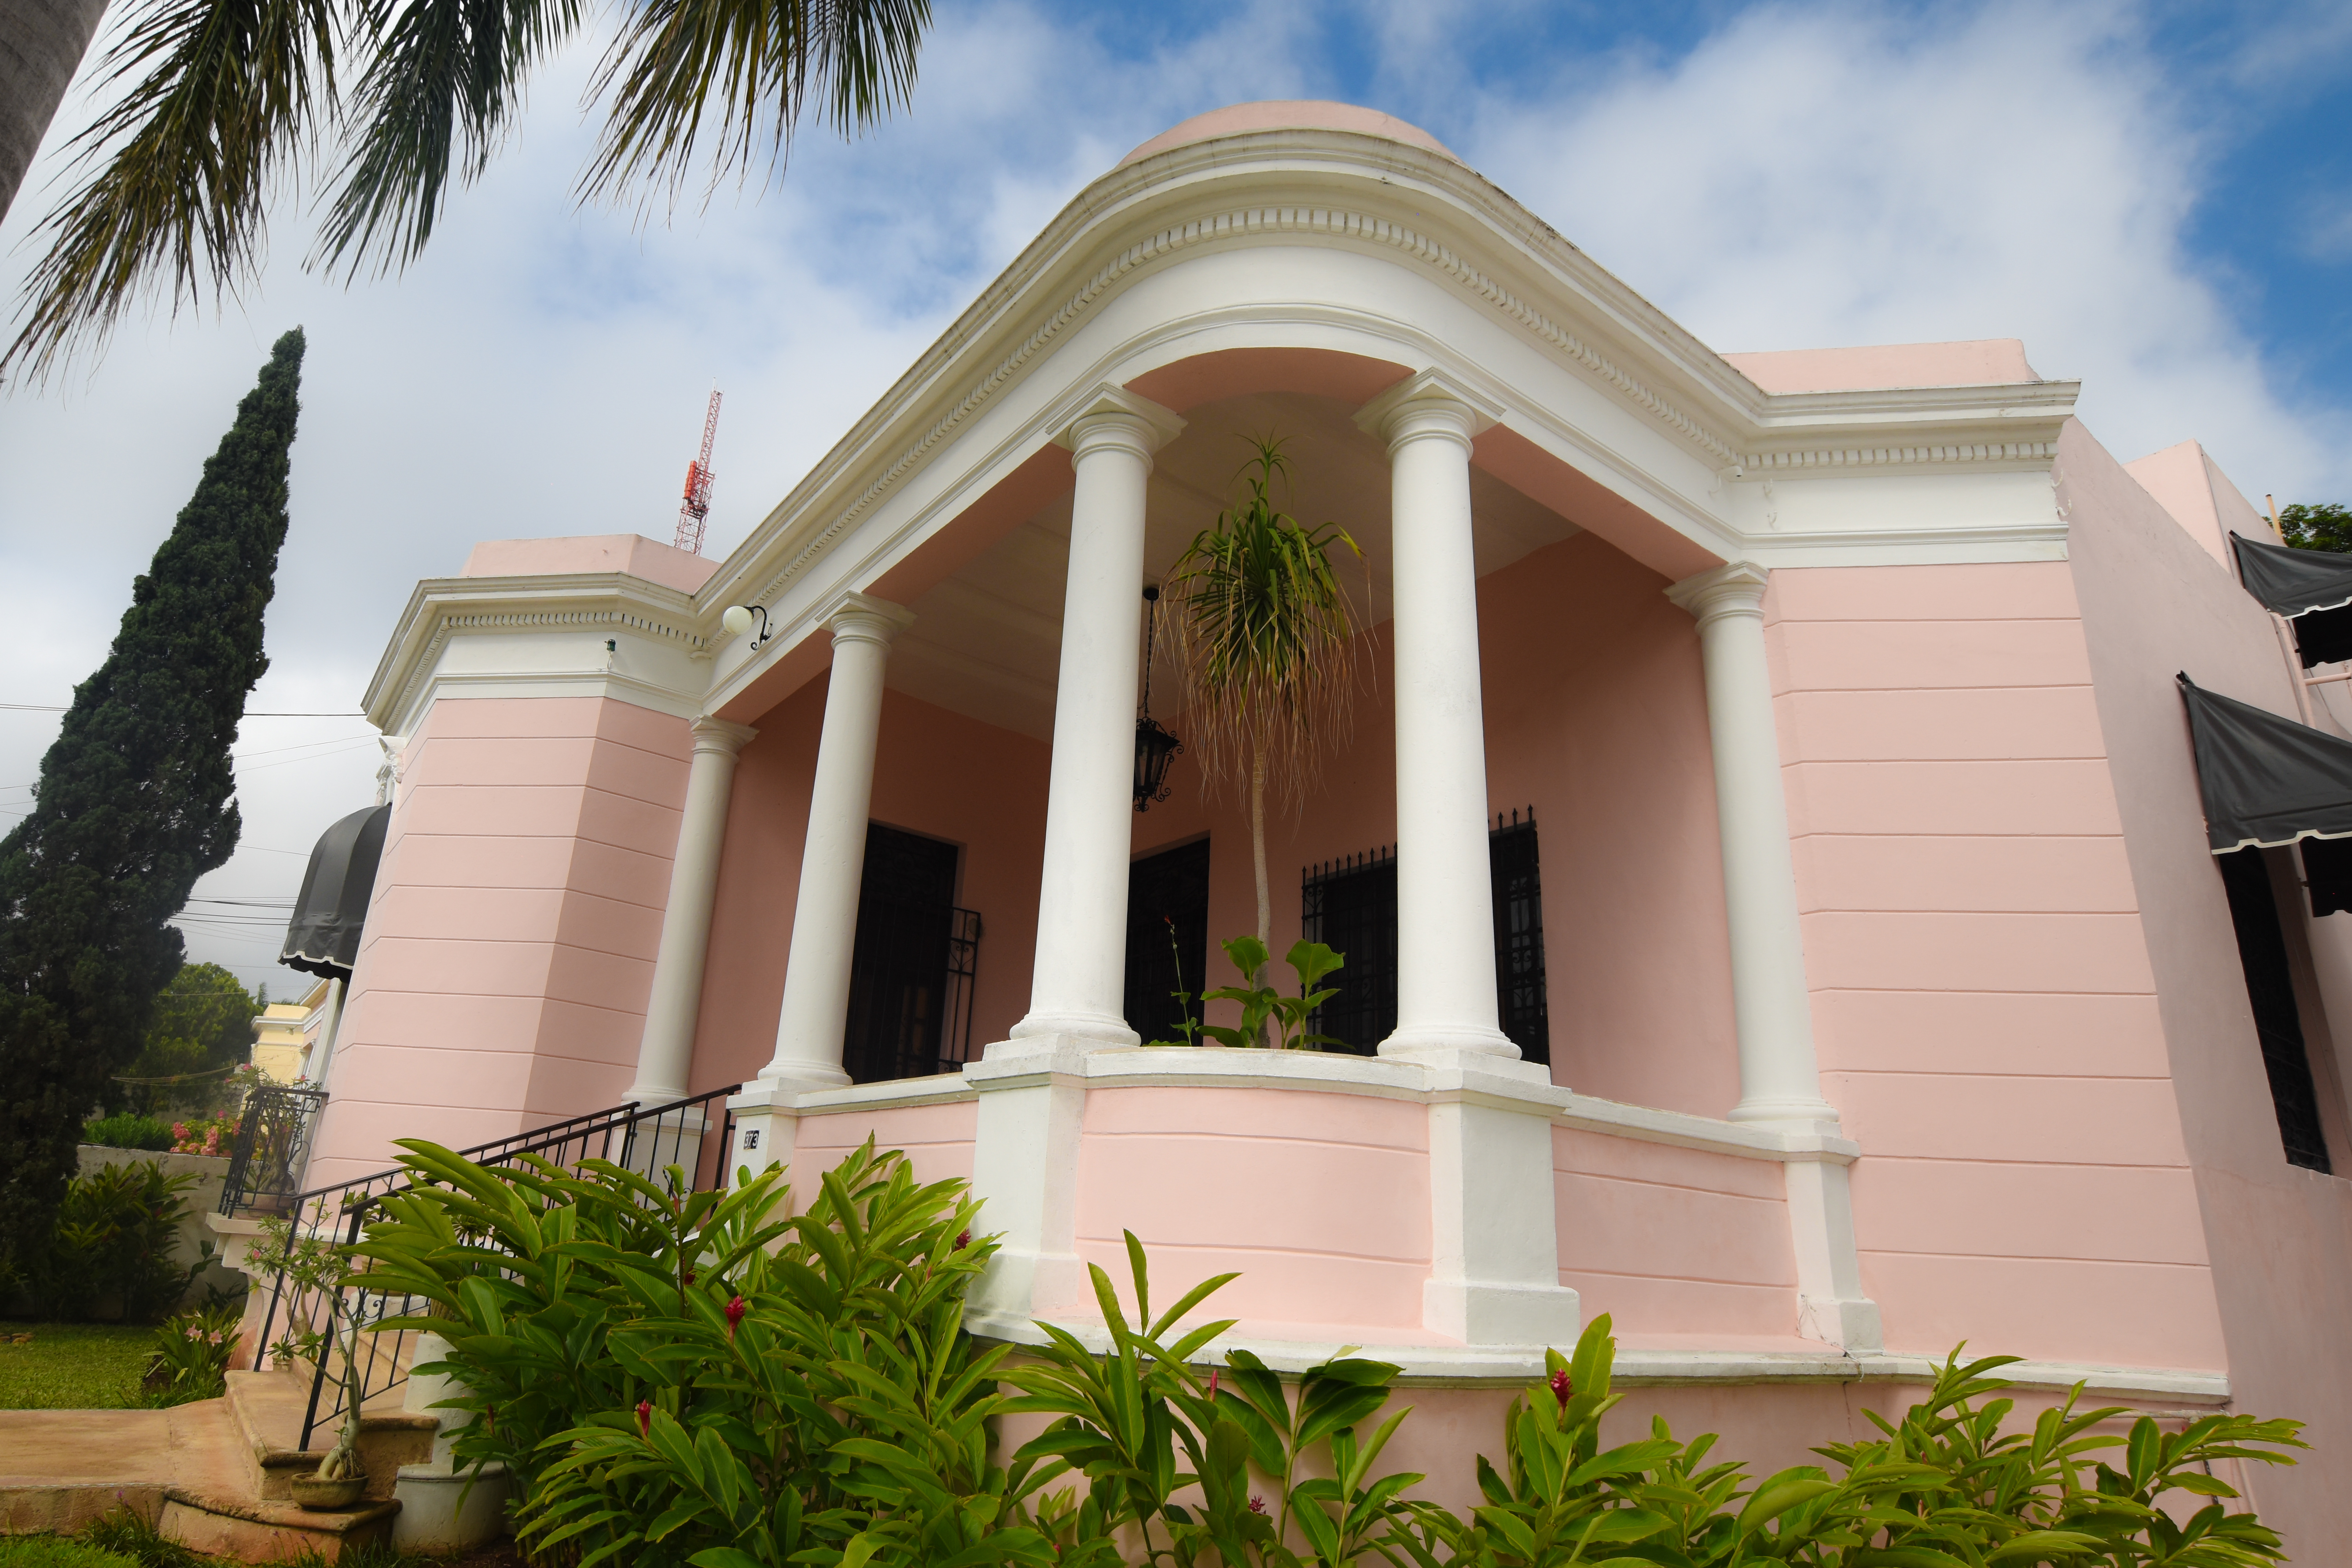 Properties for sale in Merida Yucatan Mexico